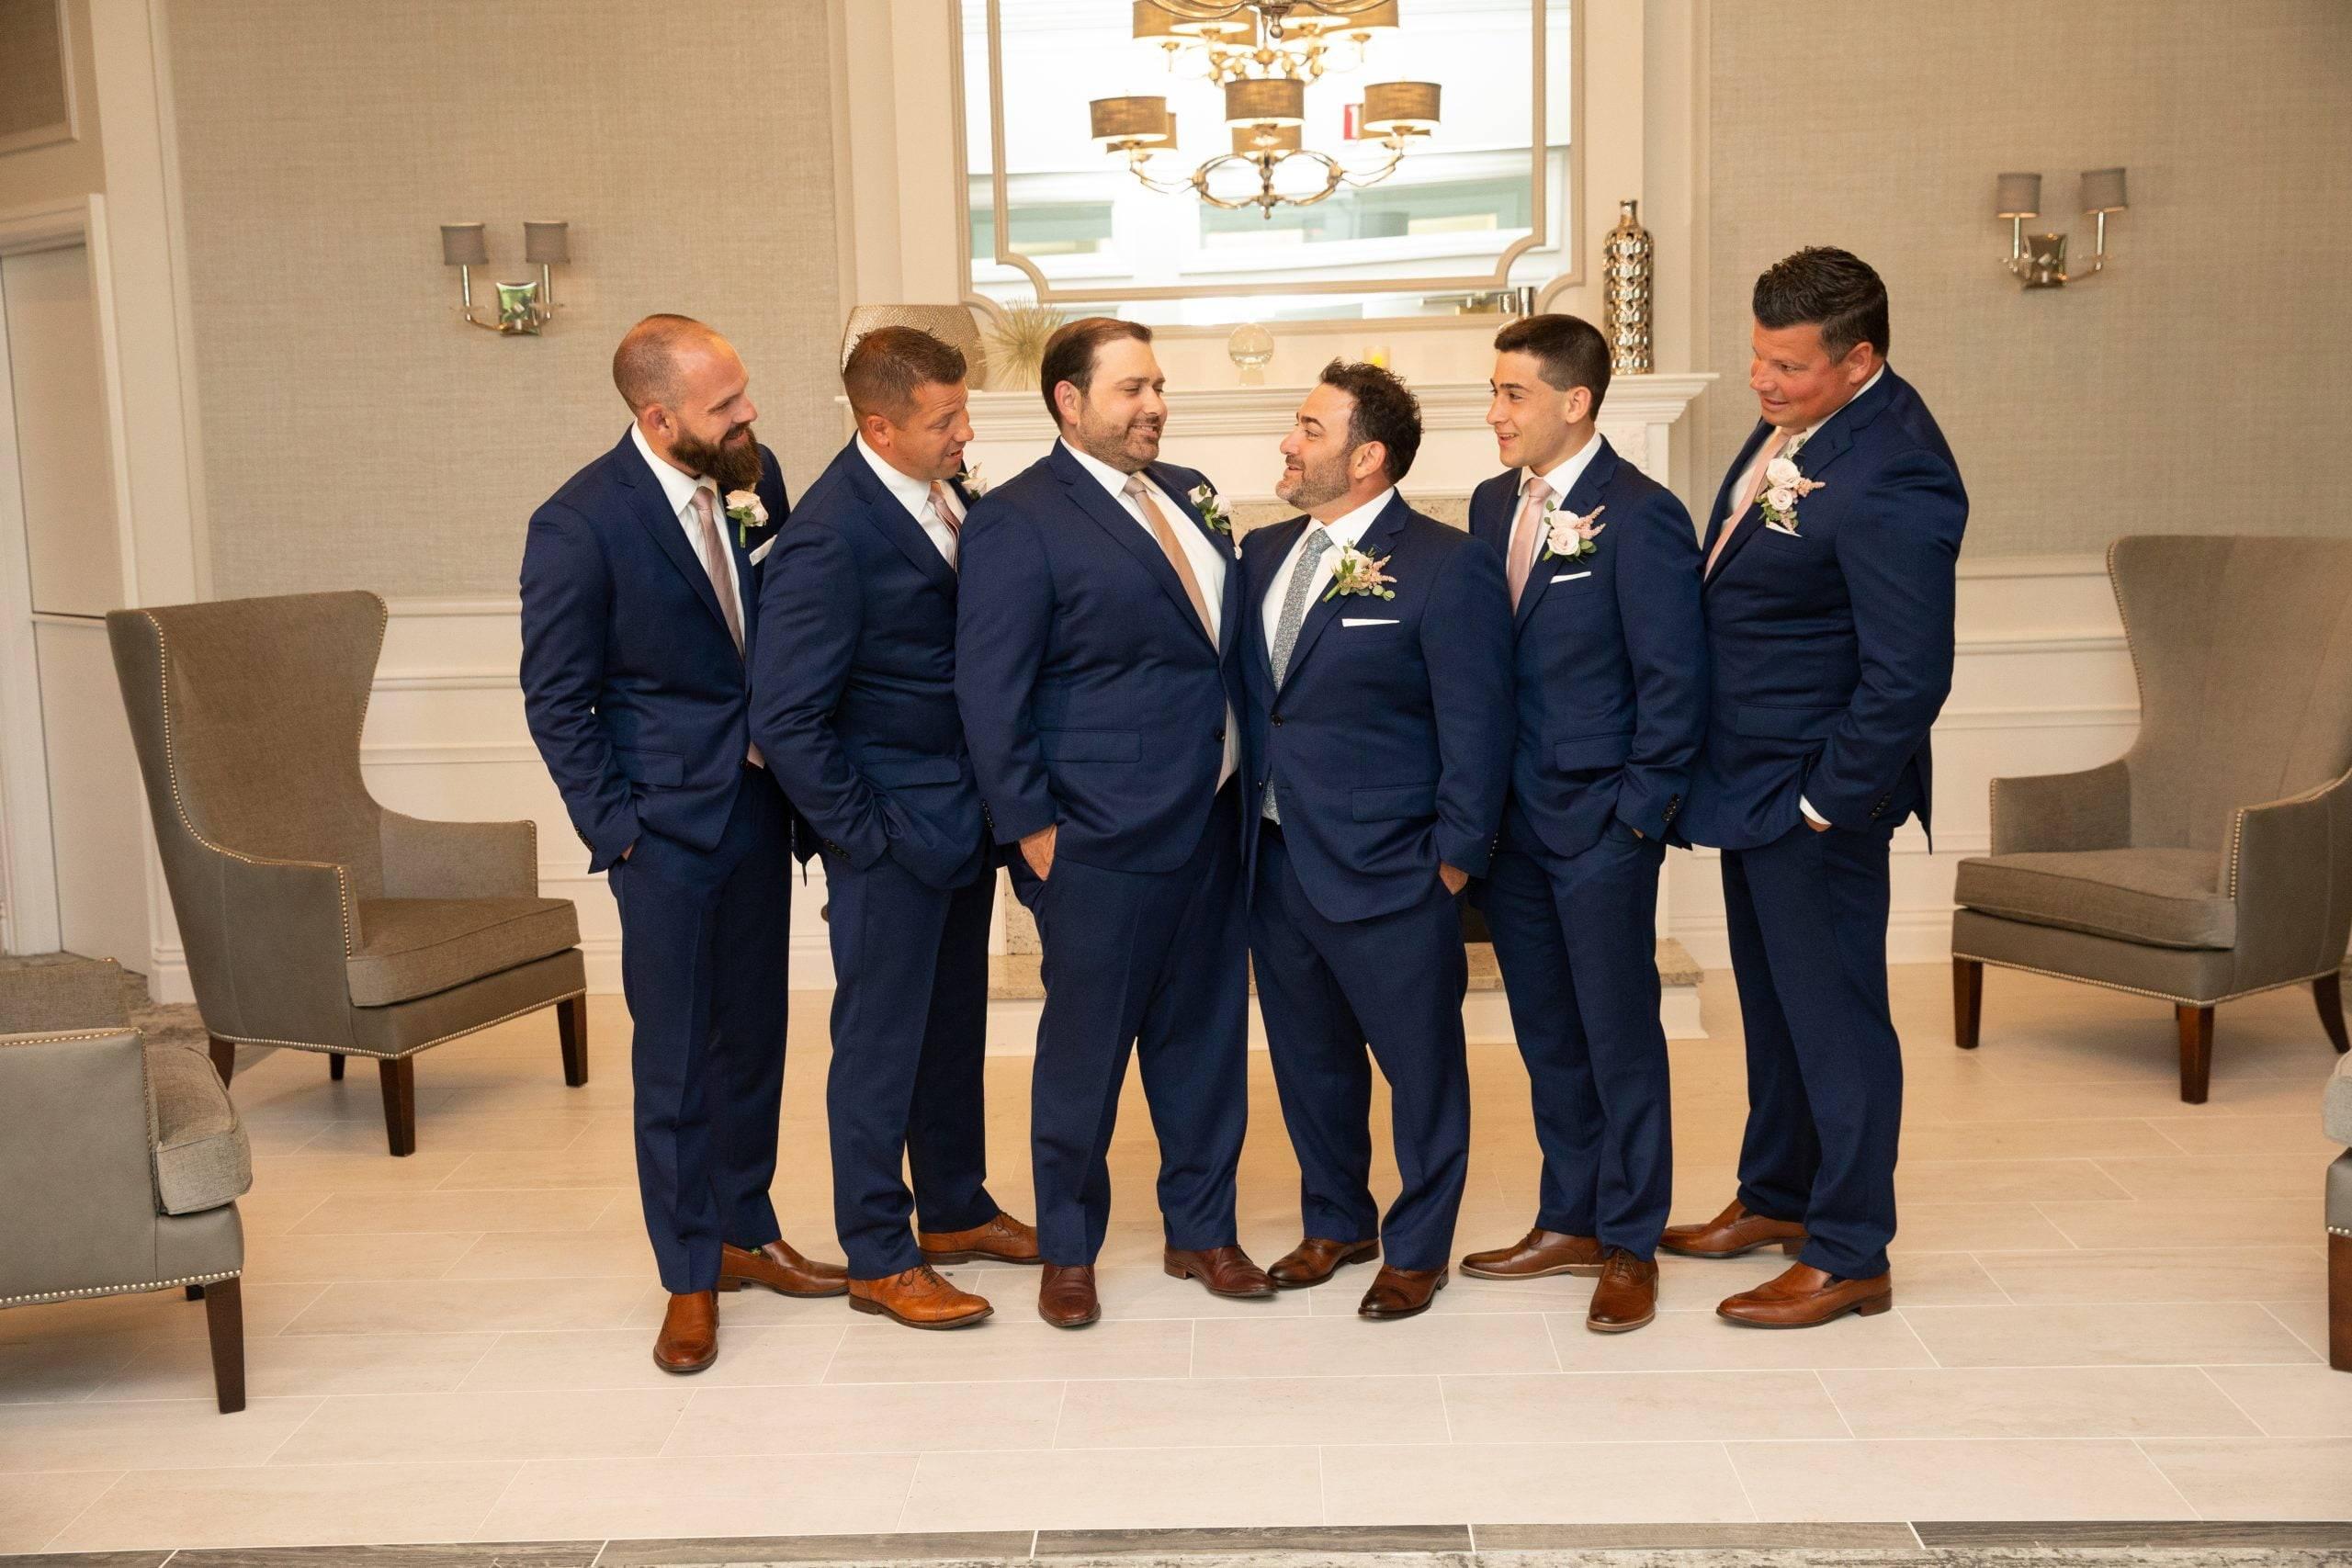 Brooklake groom and groomsmen are ready